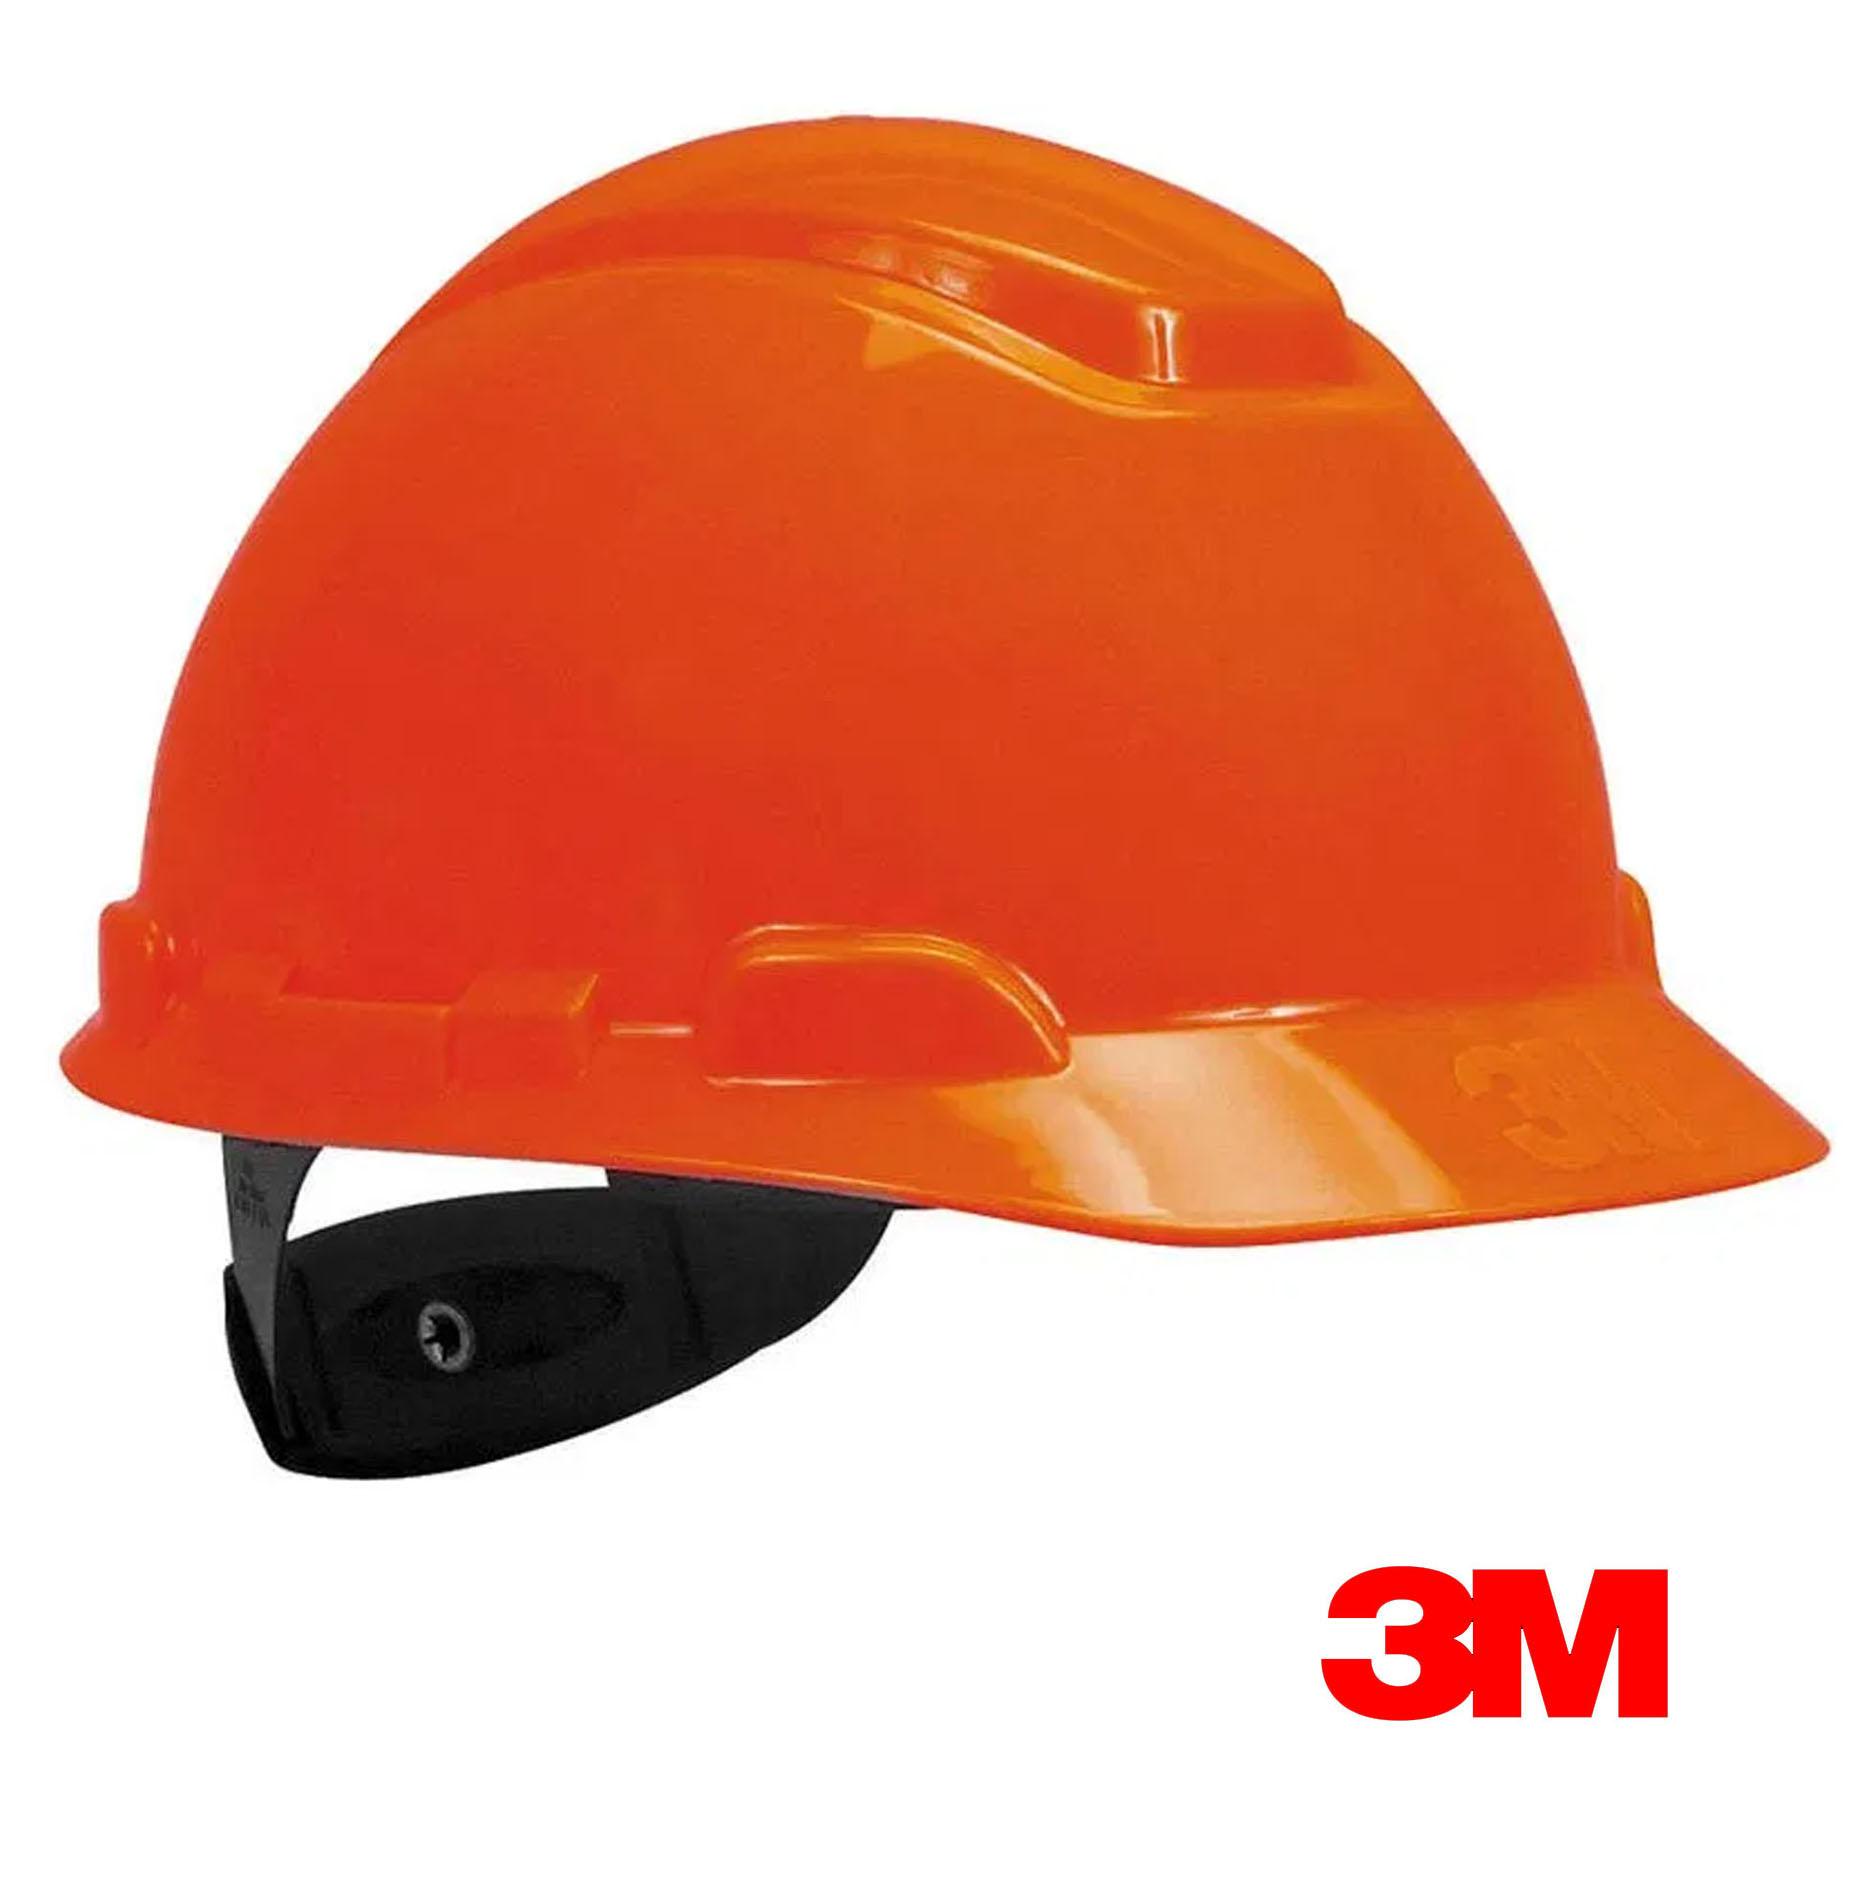 Casco de seguridad 3M Naranja Con Rachet